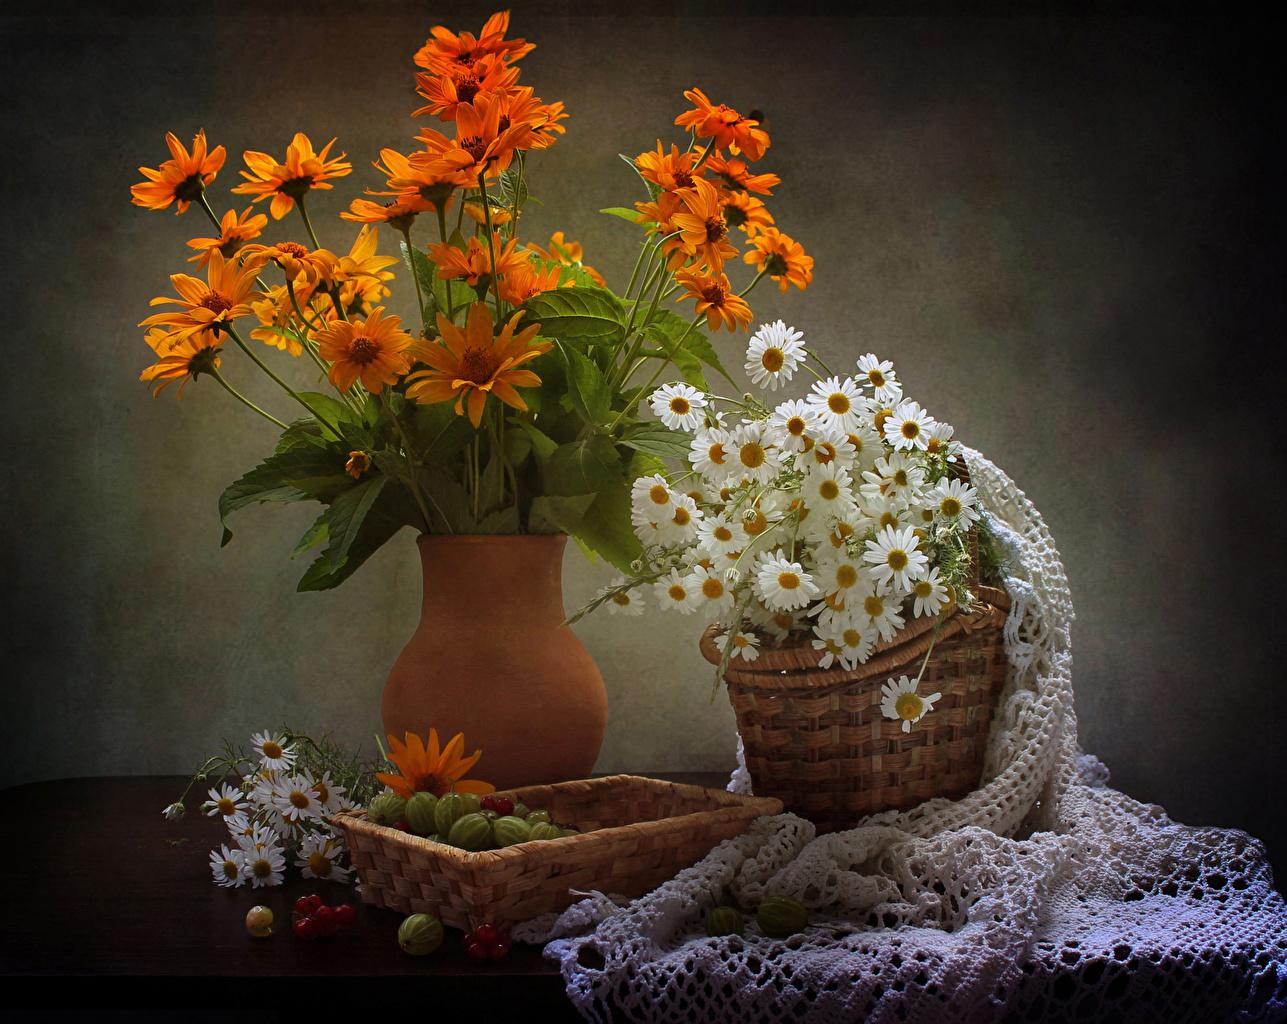 Картинки цветок Корзина Газания Ромашки Крыжовник вазы Натюрморт Цветы корзины ромашка Корзинка Ваза вазе